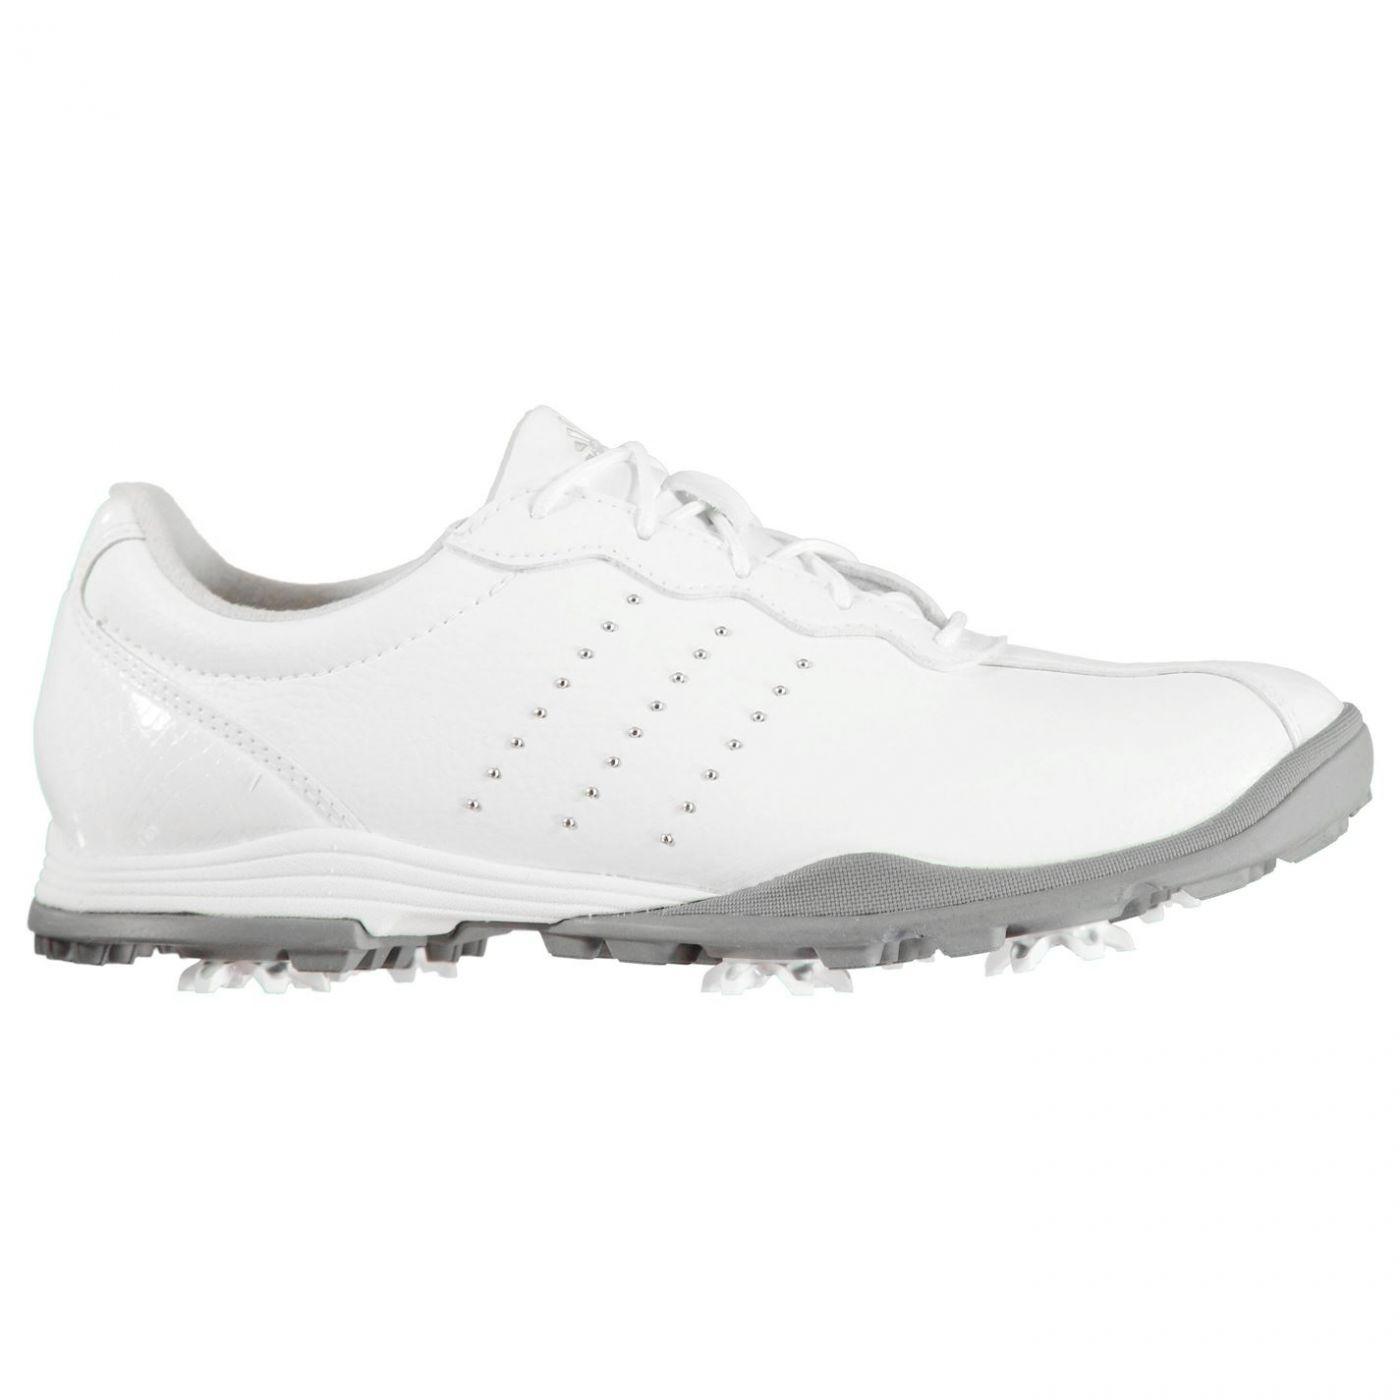 Adidas adipure DC Ladies Golf Shoes